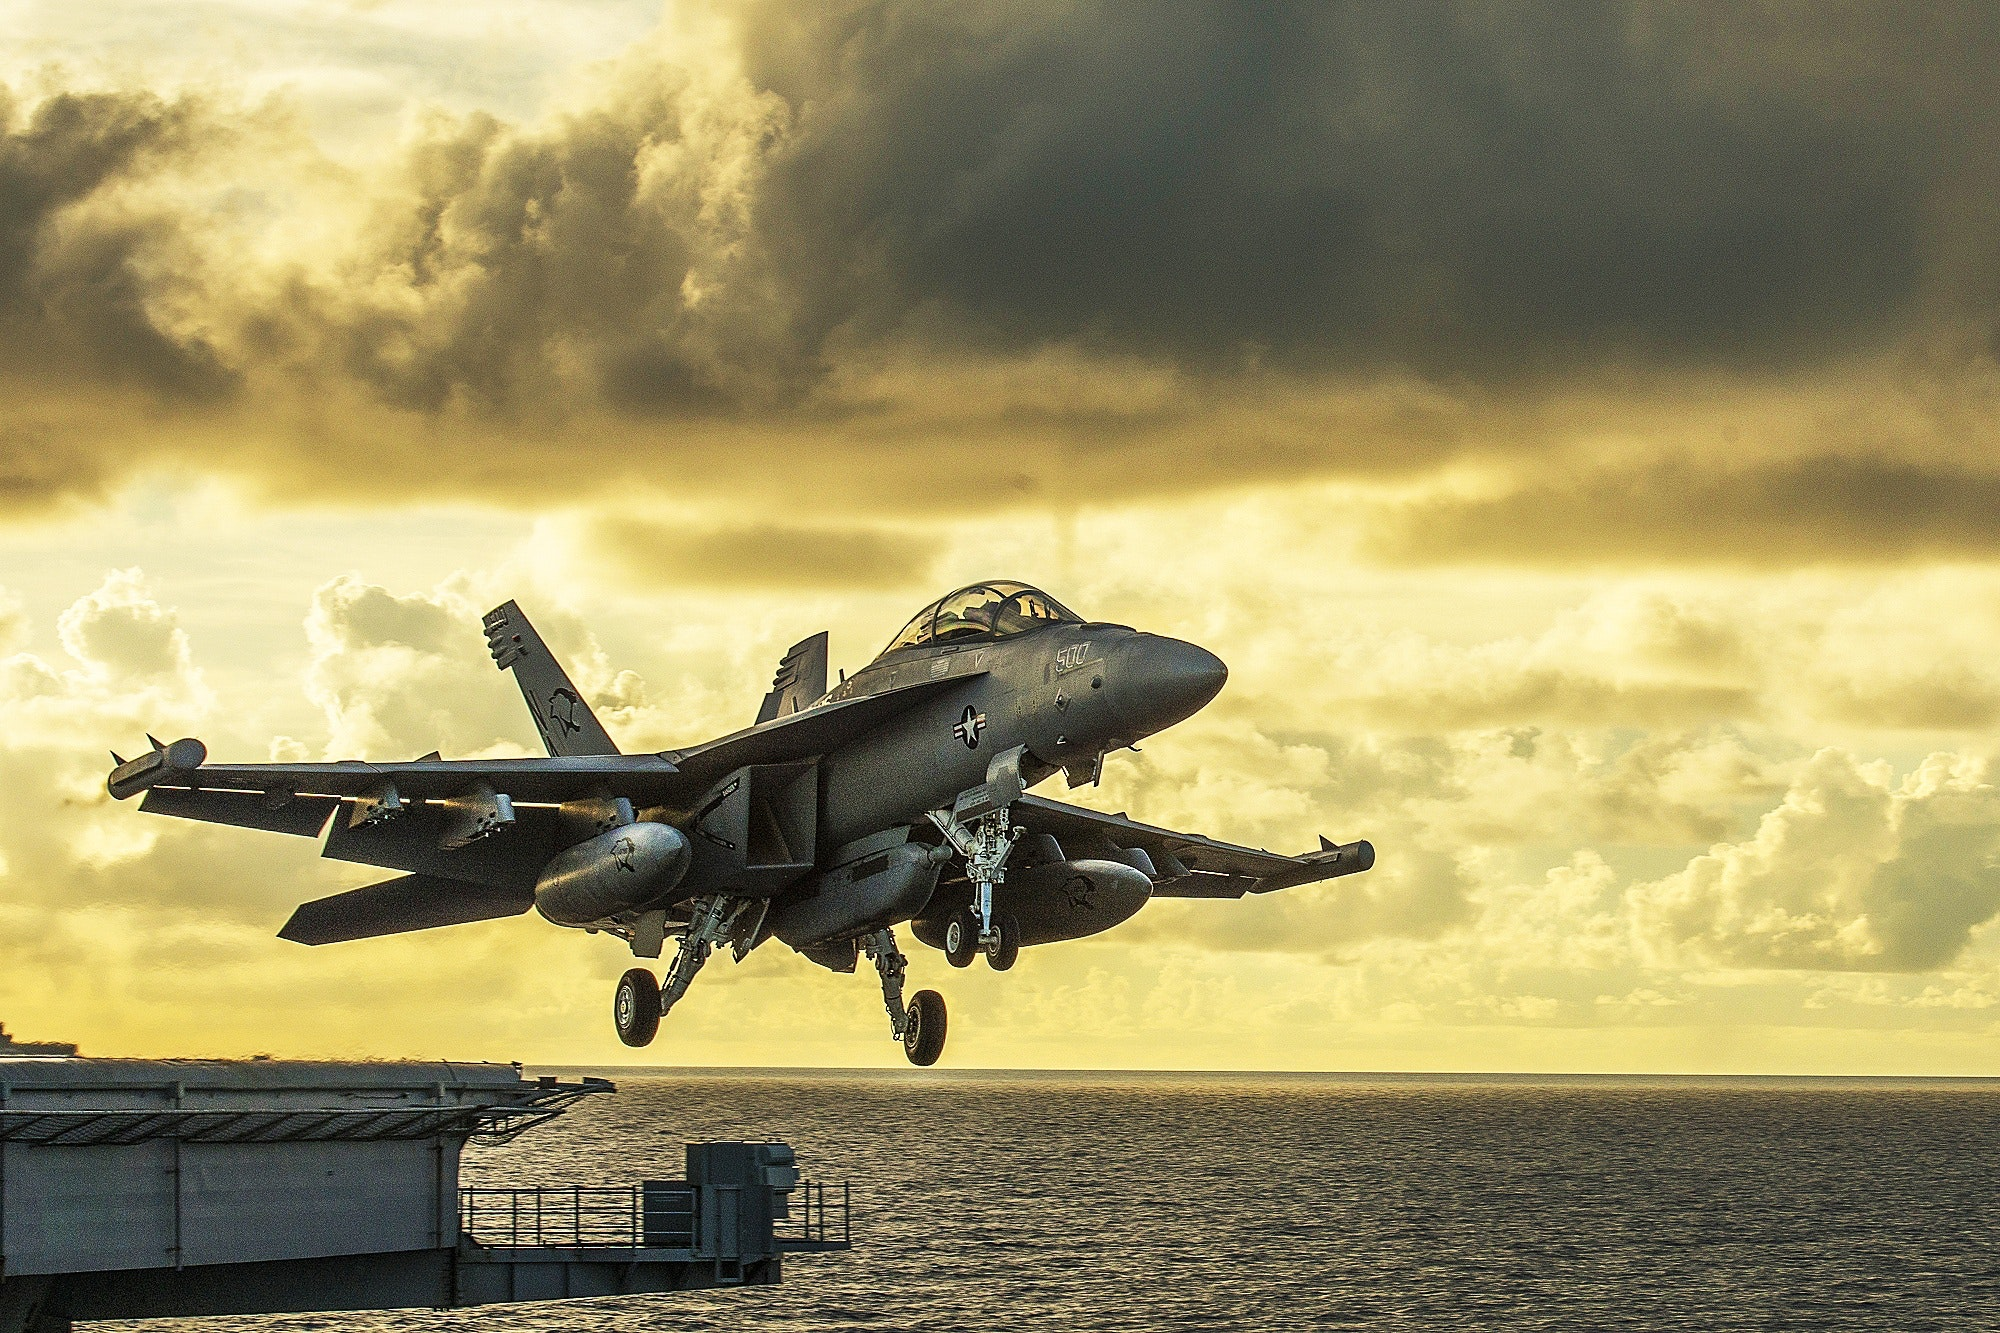 Gray combat air craft under yellow sky photo